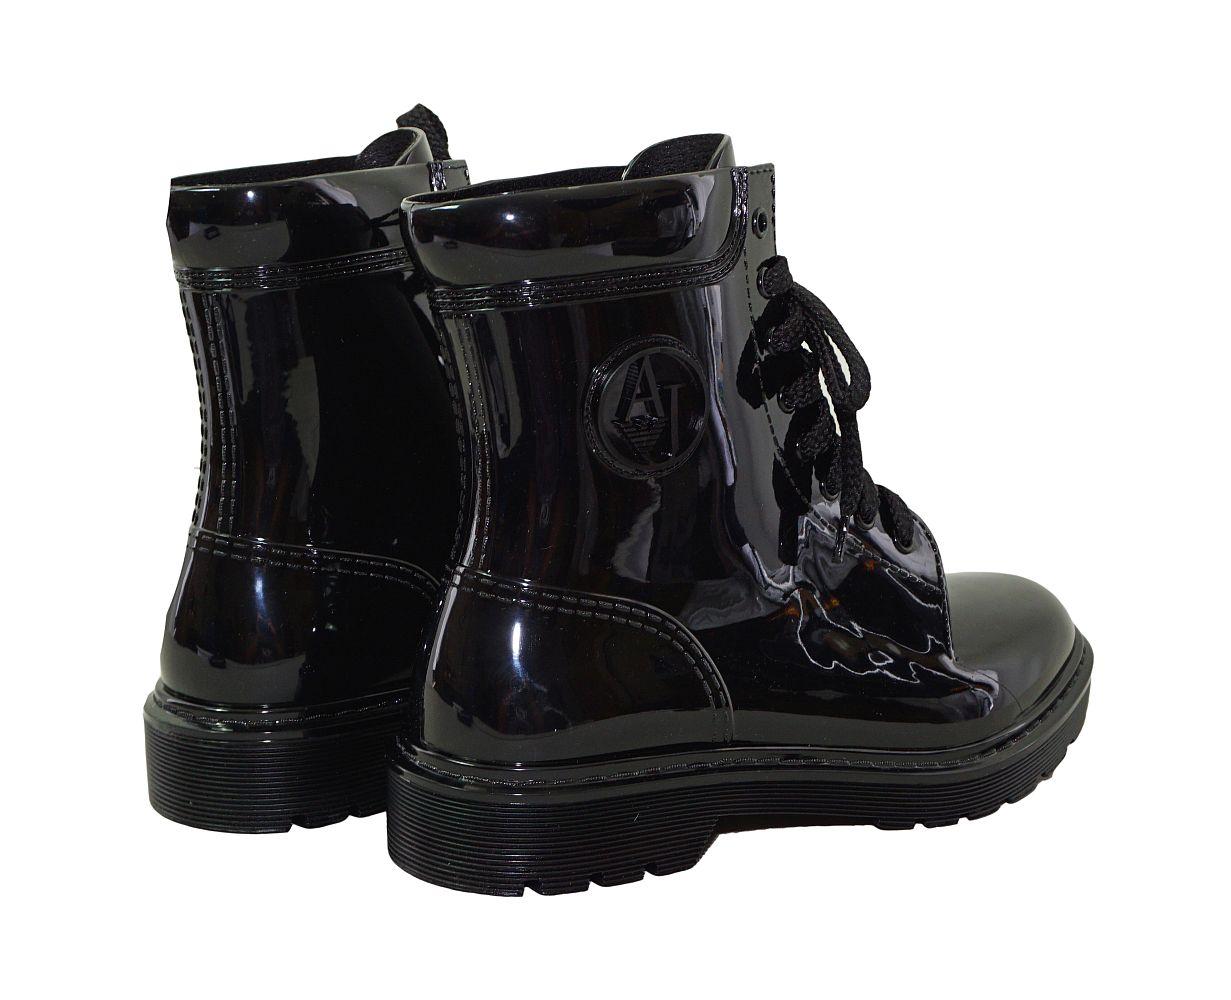 Armani Jeans Schuhe Stiefel Boot schwarz 925118 6A520 00020 Nero HW16-AJ